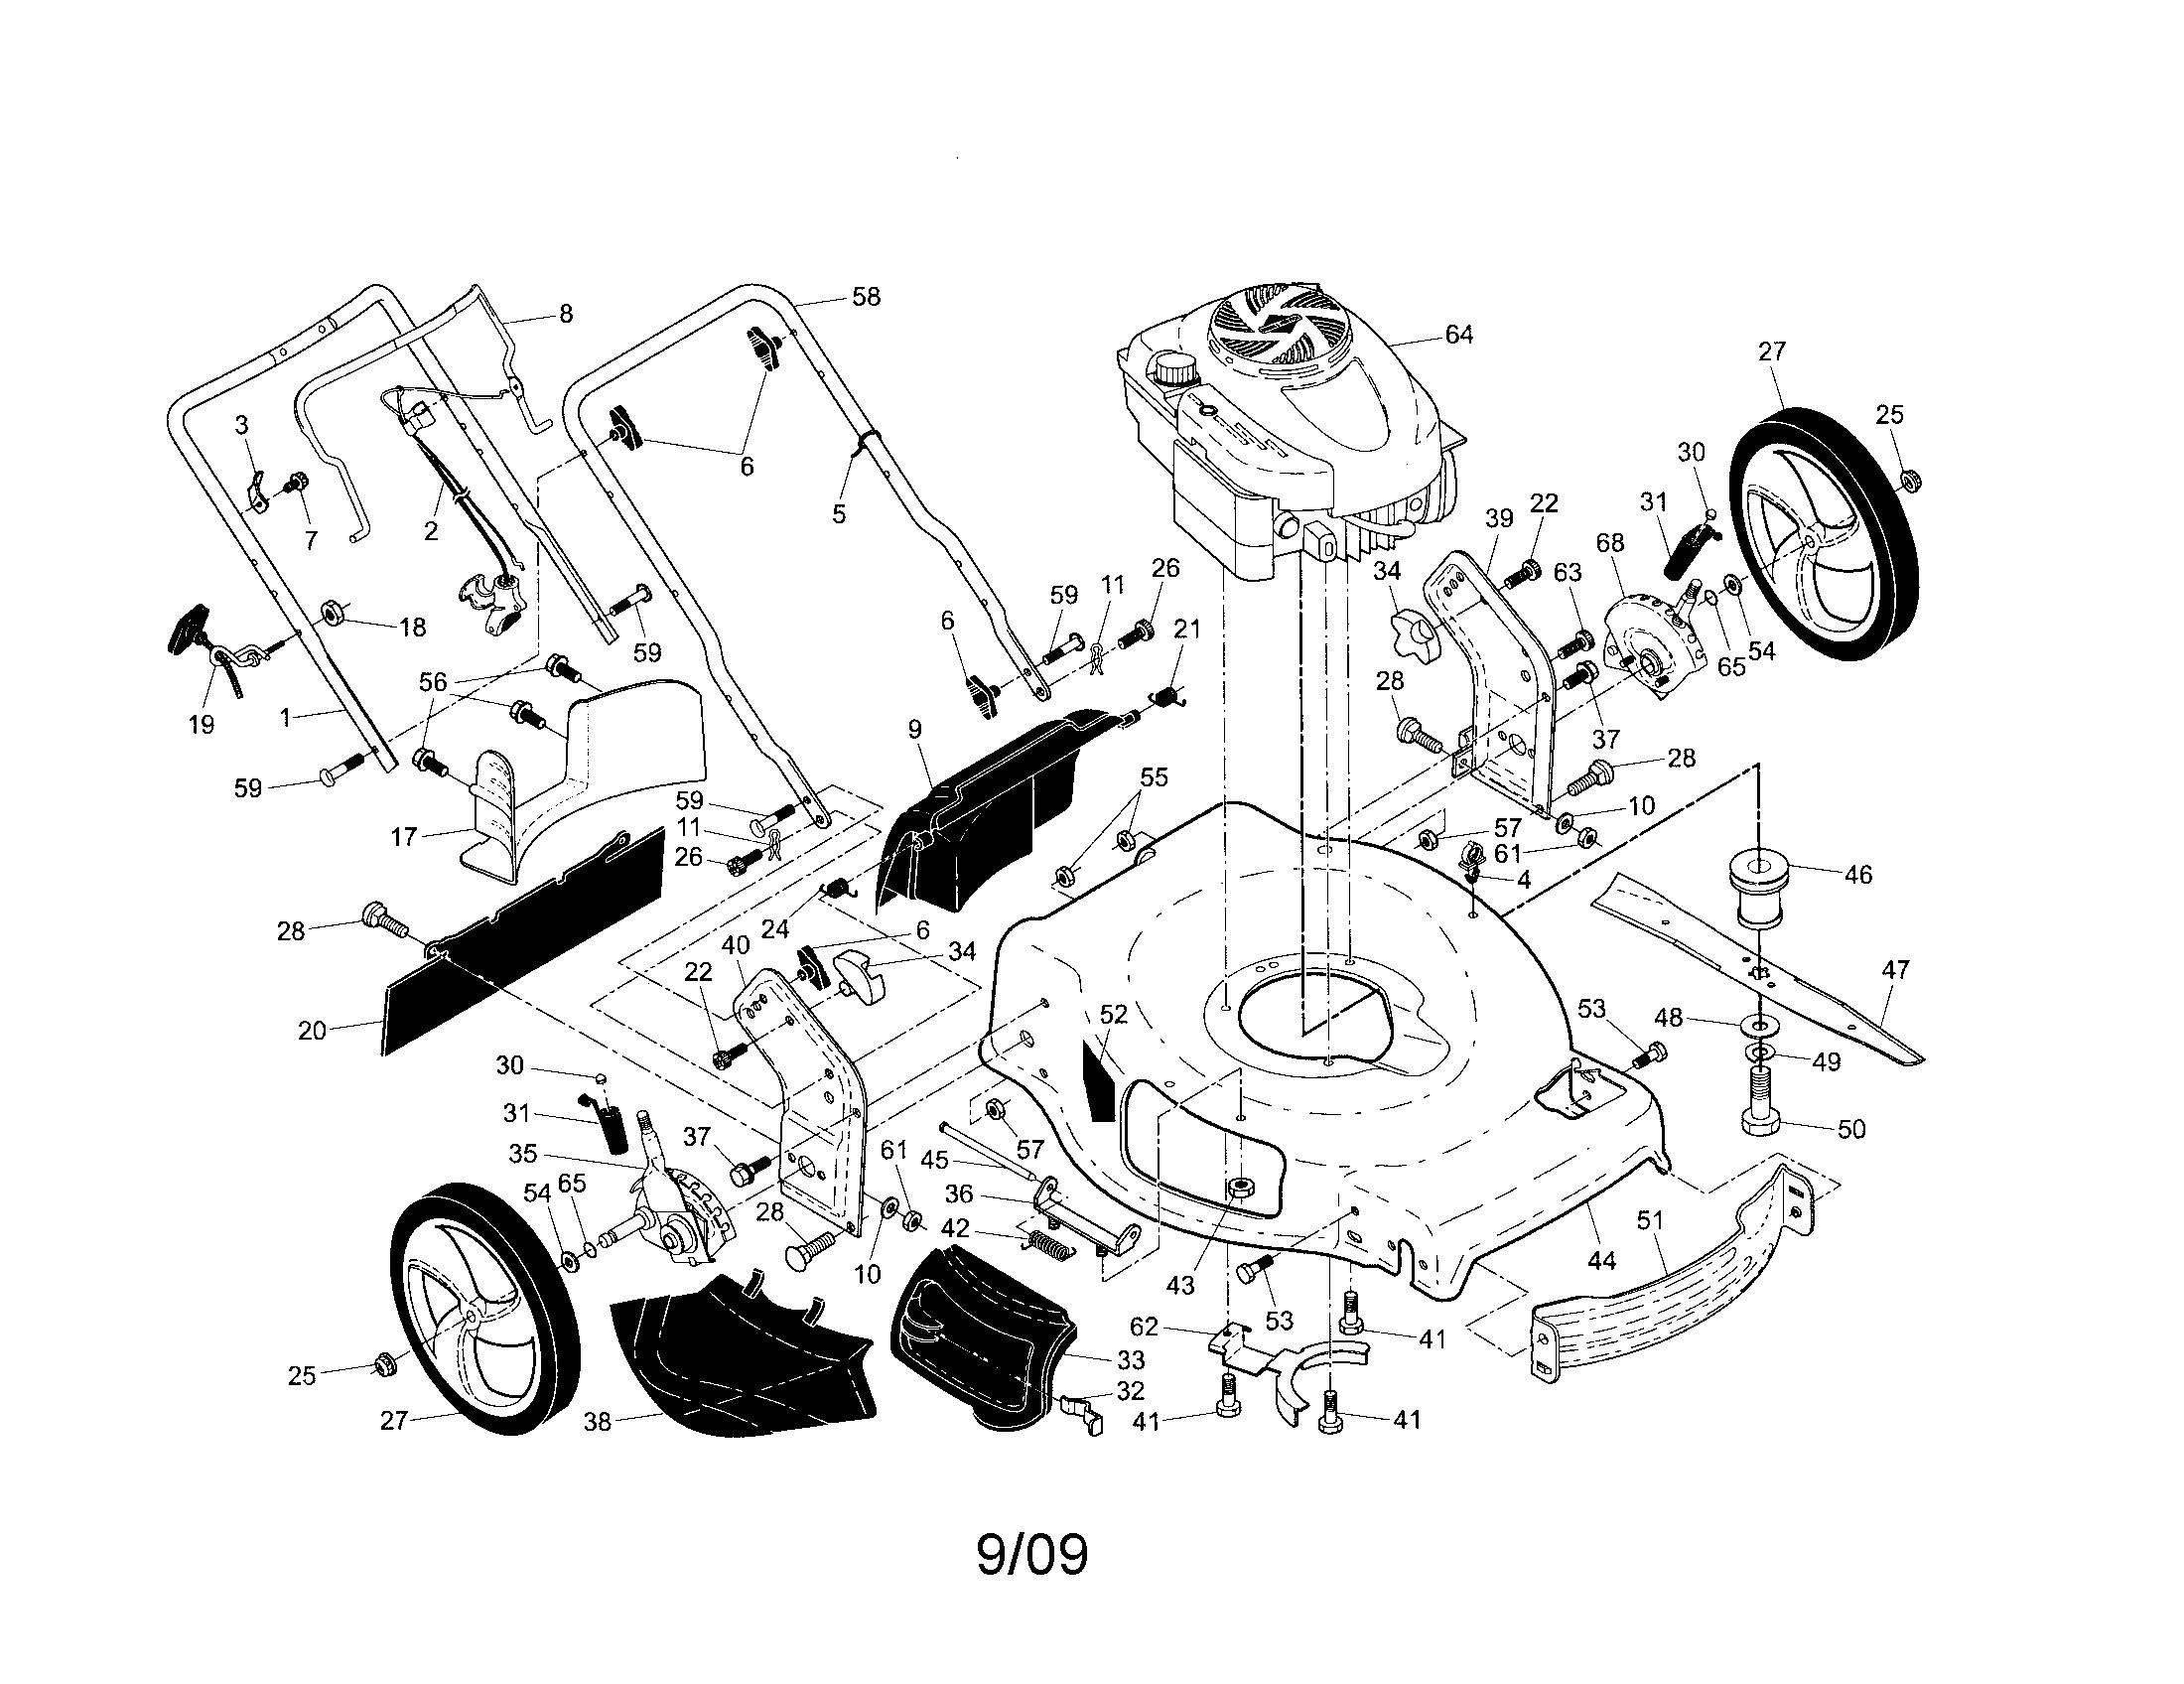 Craftsman Lawn Tractor Parts Diagram Craftsman Model Walk Behind Lawnmower Gas Genuine Parts Of Craftsman Lawn Tractor Parts Diagram